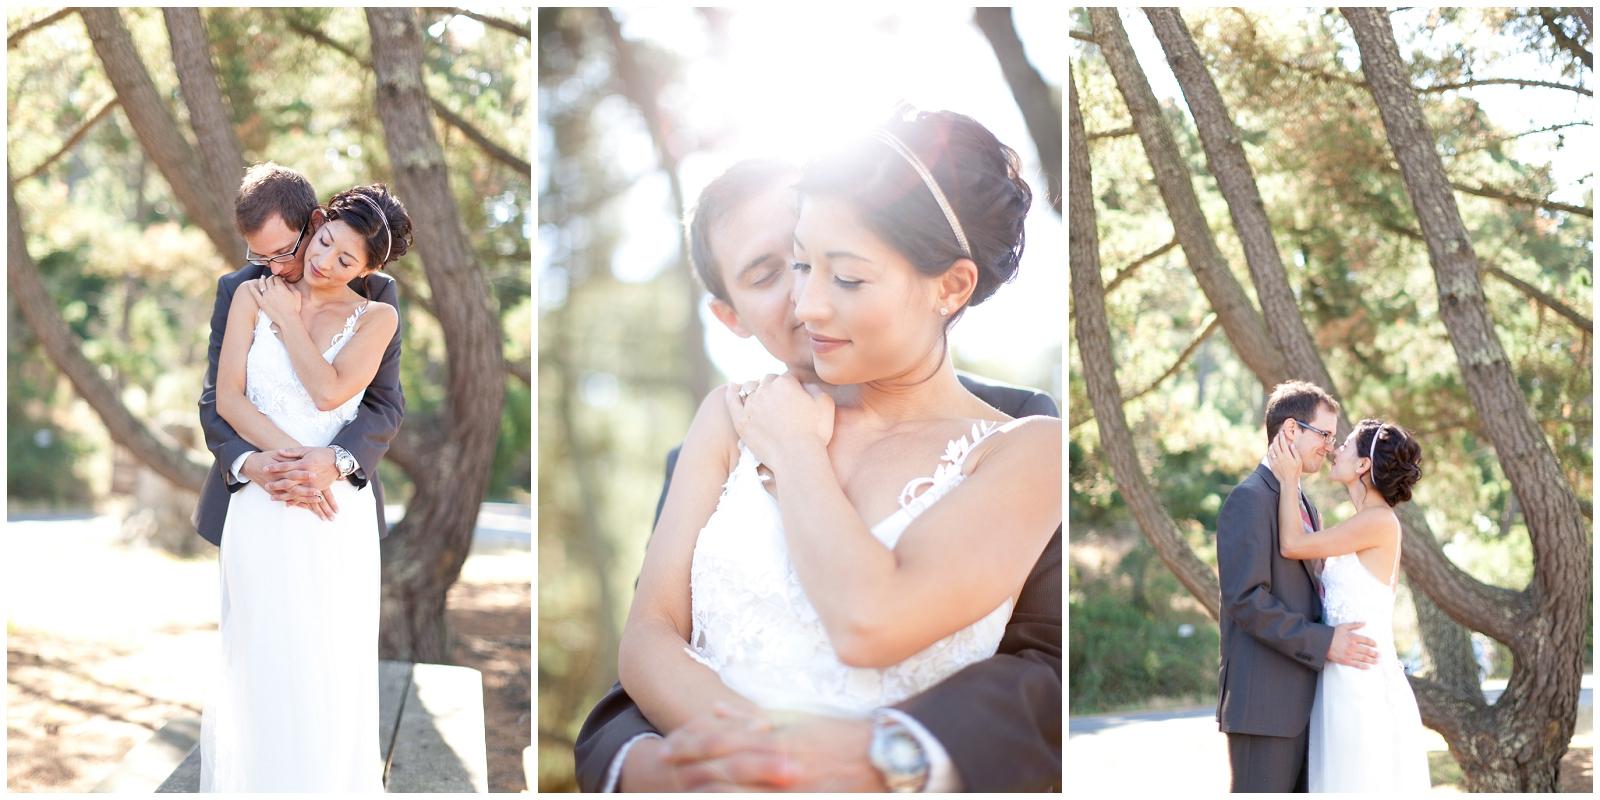 San-Francisco-Bay-Area-Wedding-Photography-Brazilian-Room-7.jpg